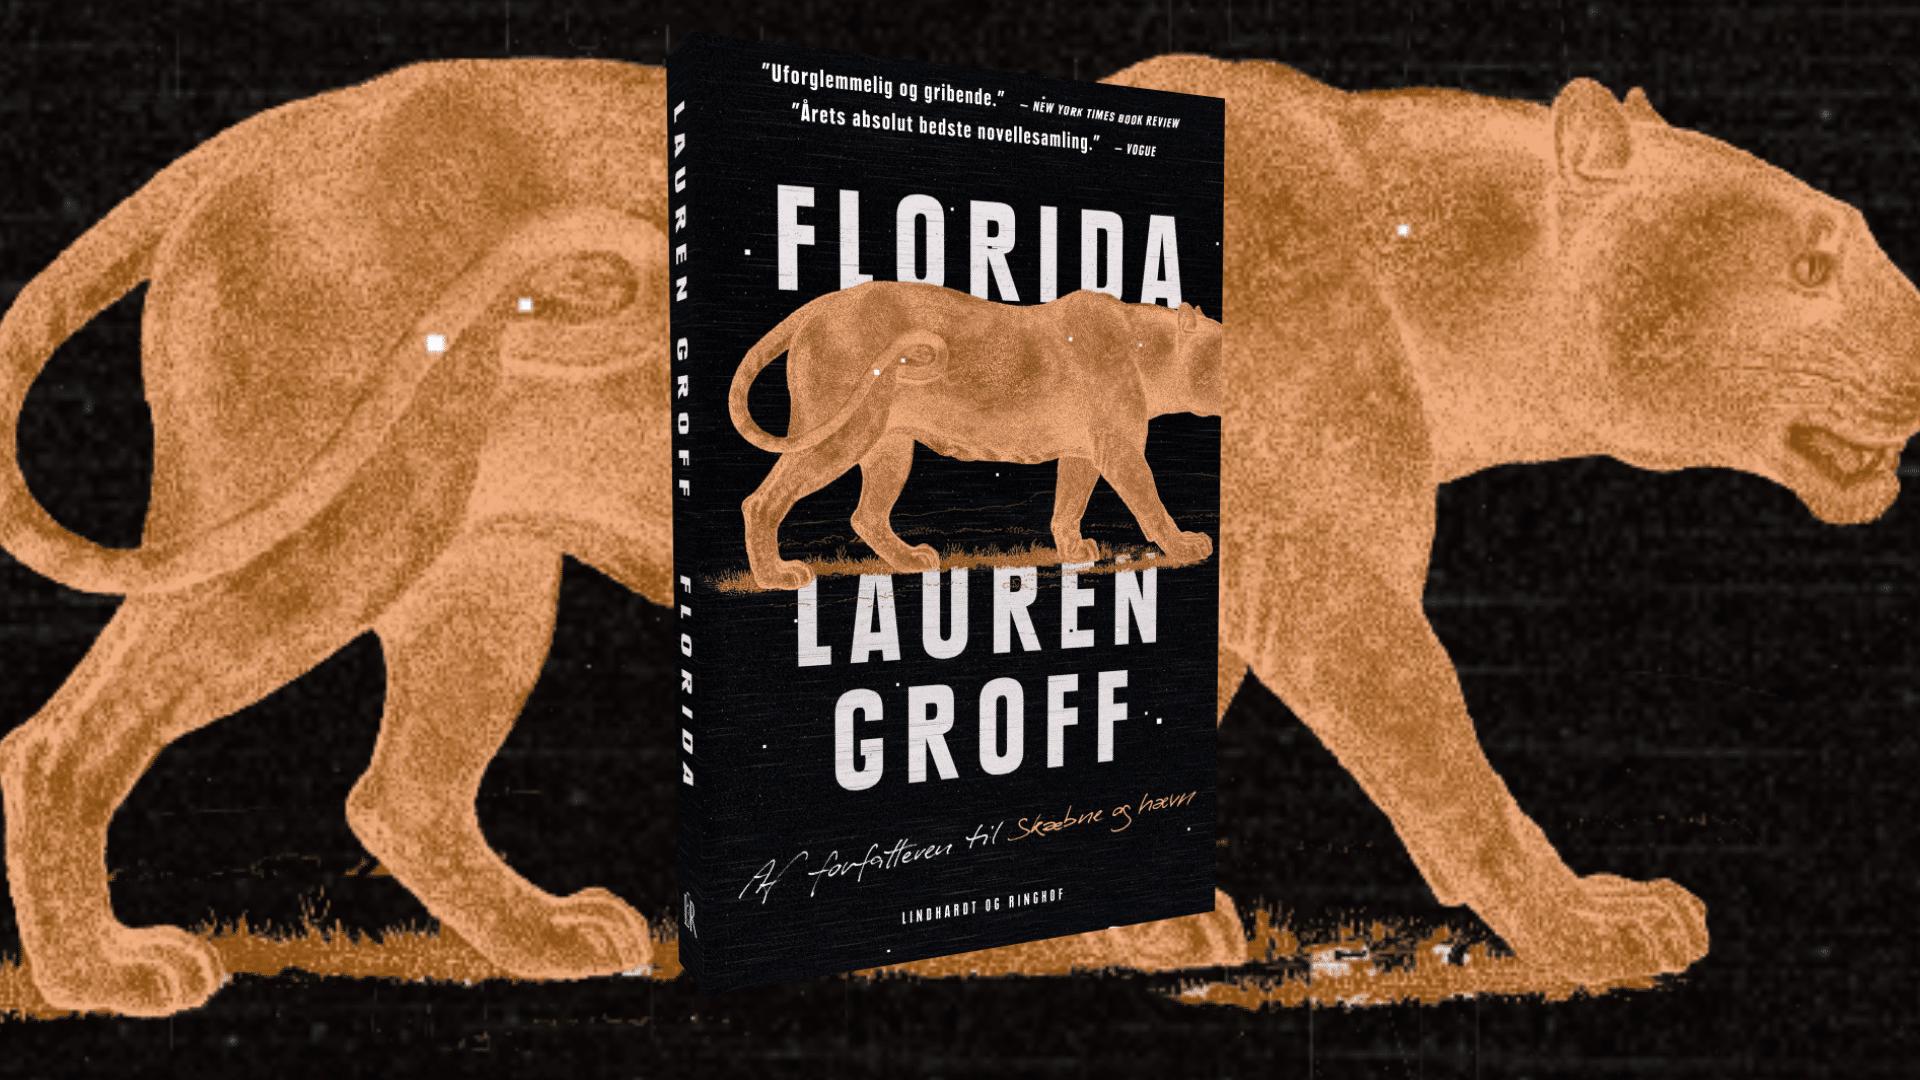 florida, lauren groff, novellesamling